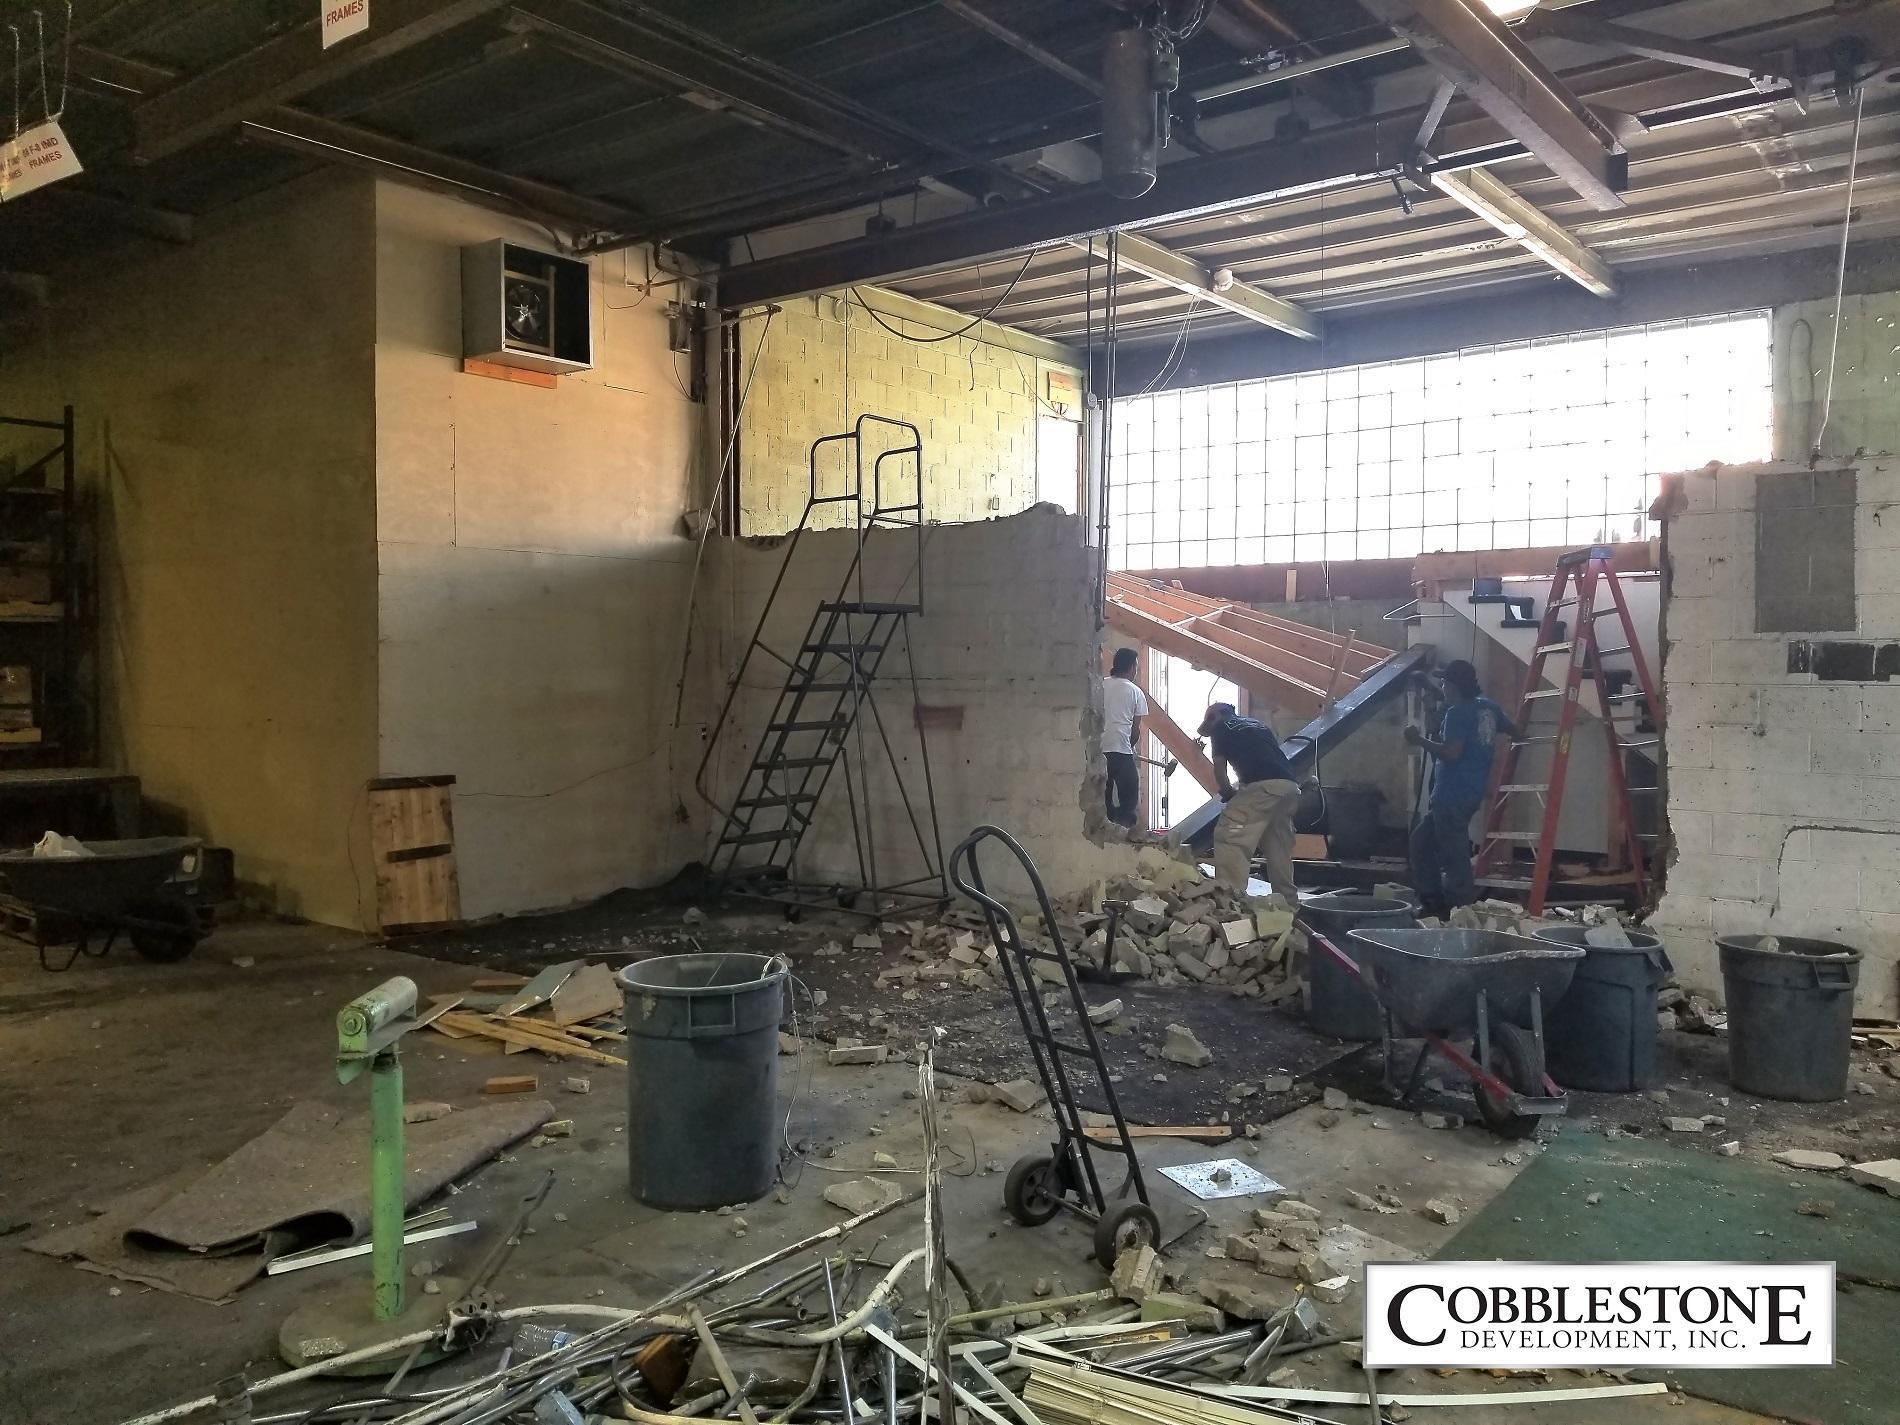 Cobblestone Development Inc. image 7